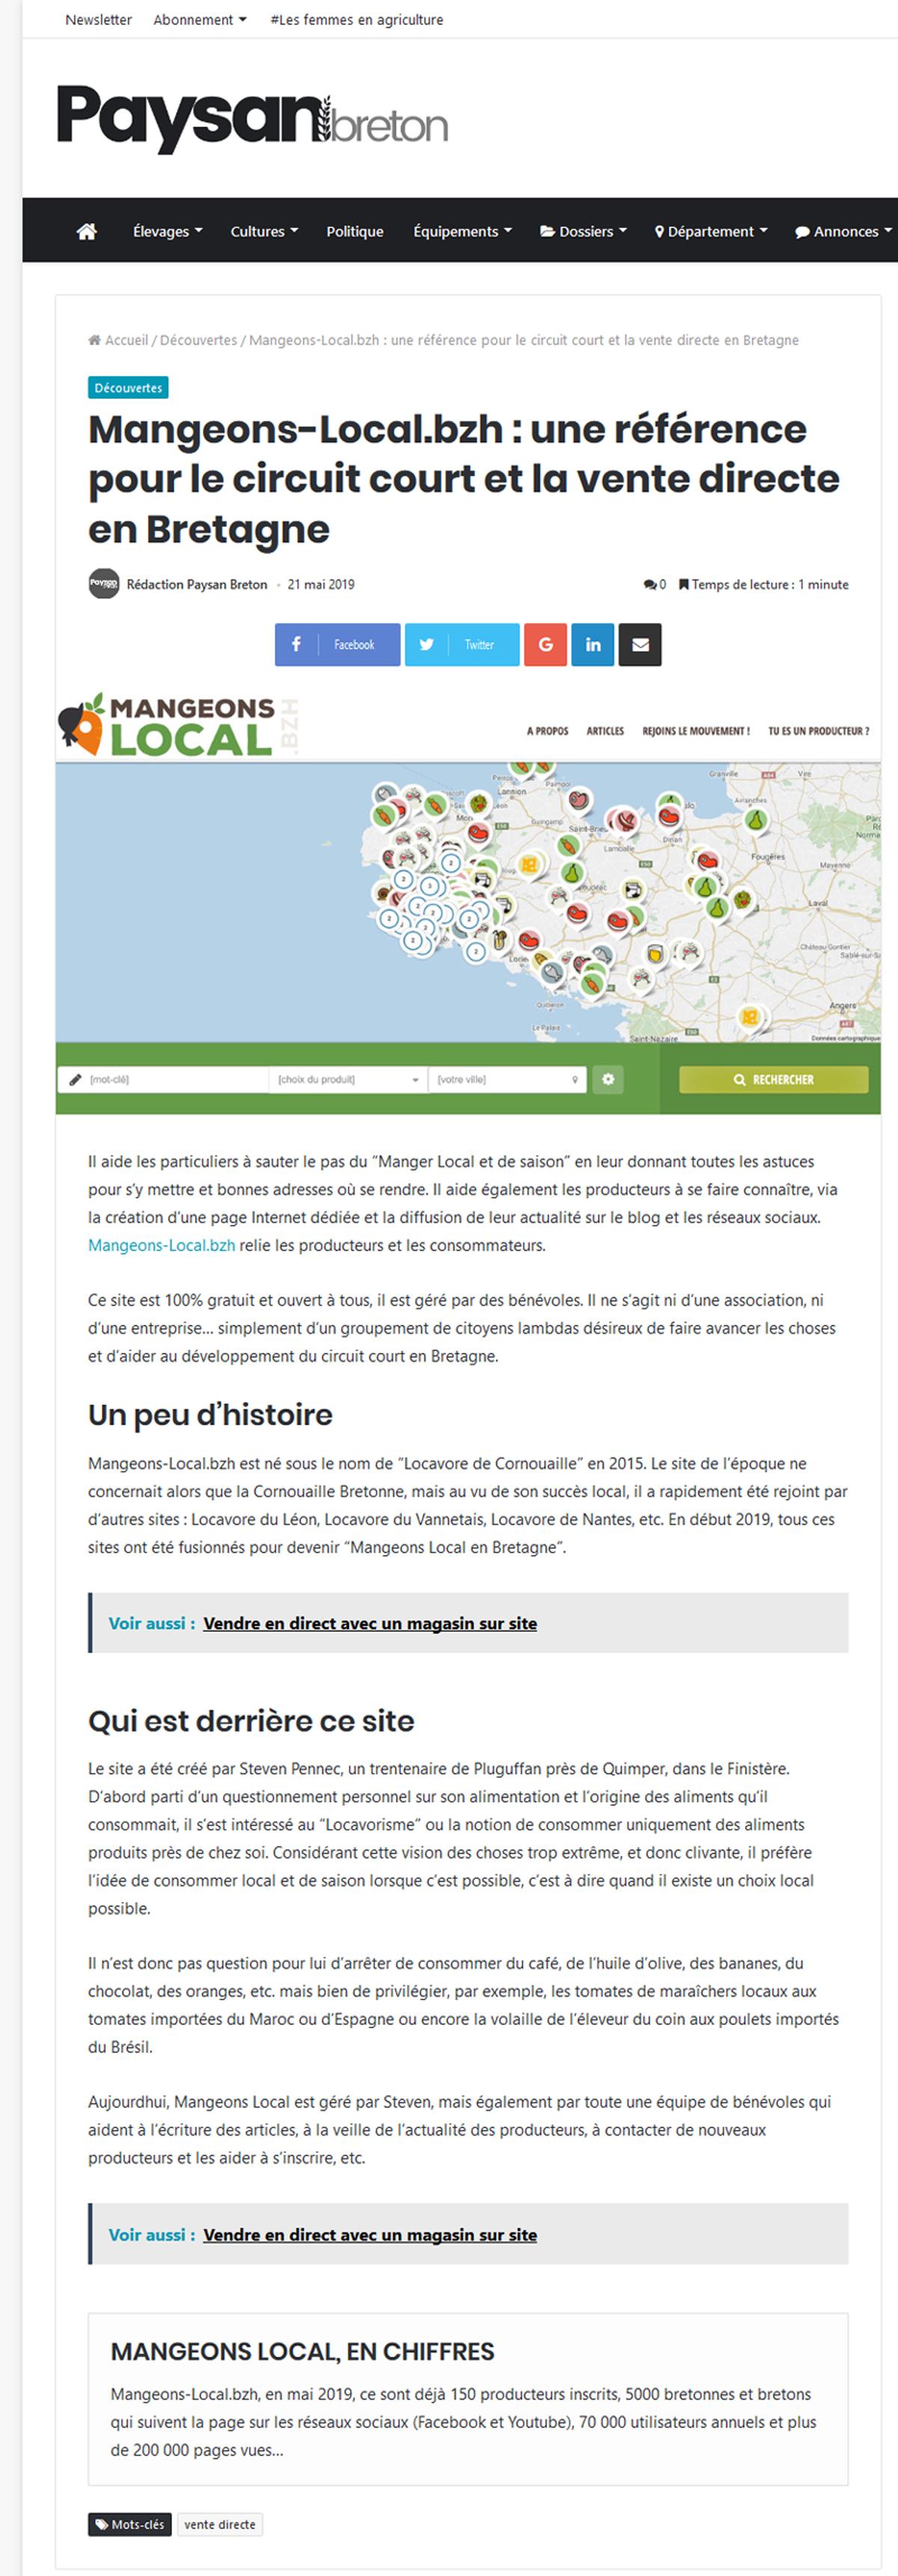 Paysan Breton parle de Mangeons Local !